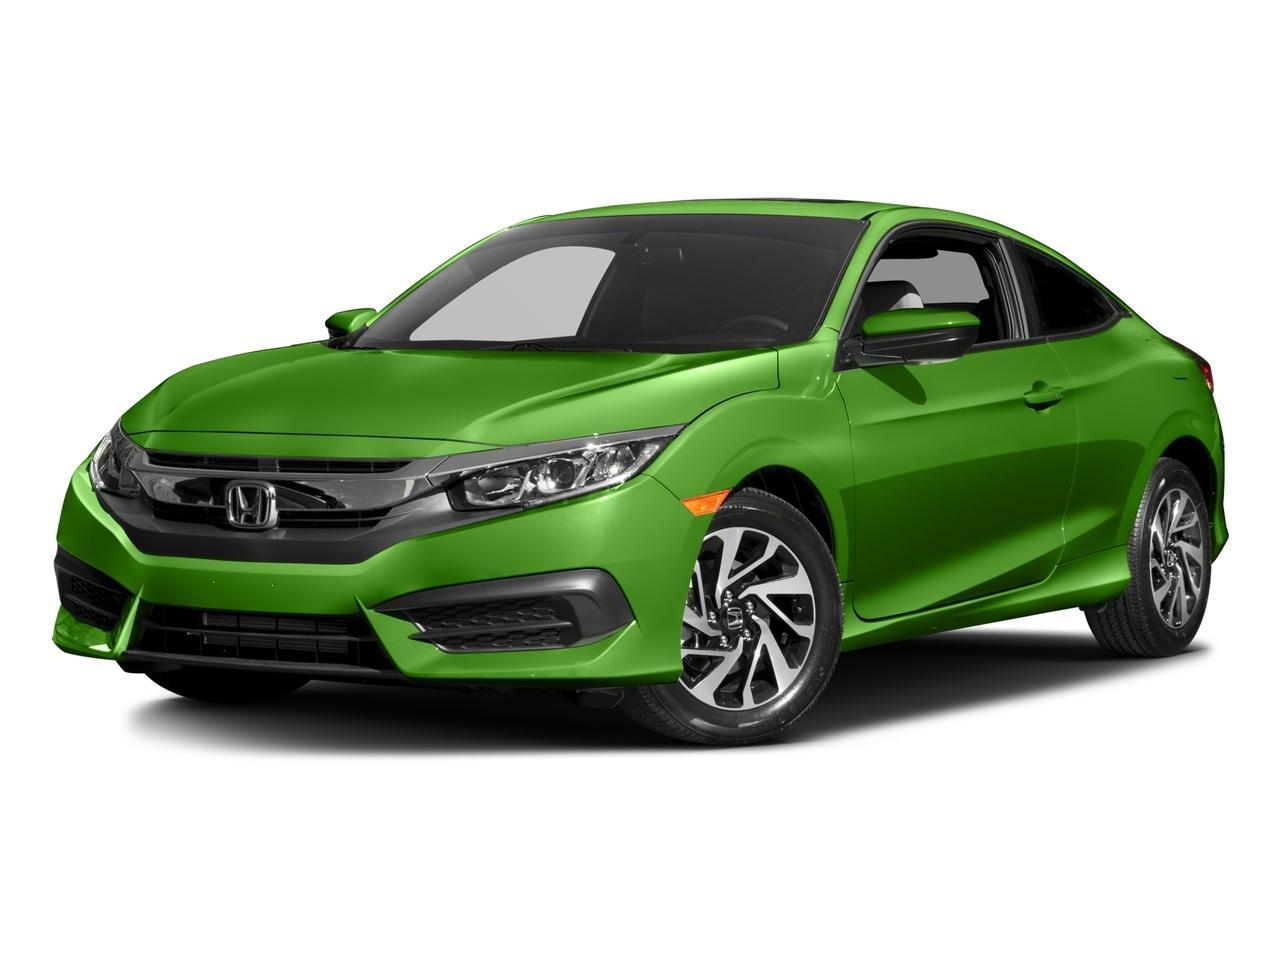 2016 Honda Civic Coupe Vehicle Photo in Appleton, WI 54914